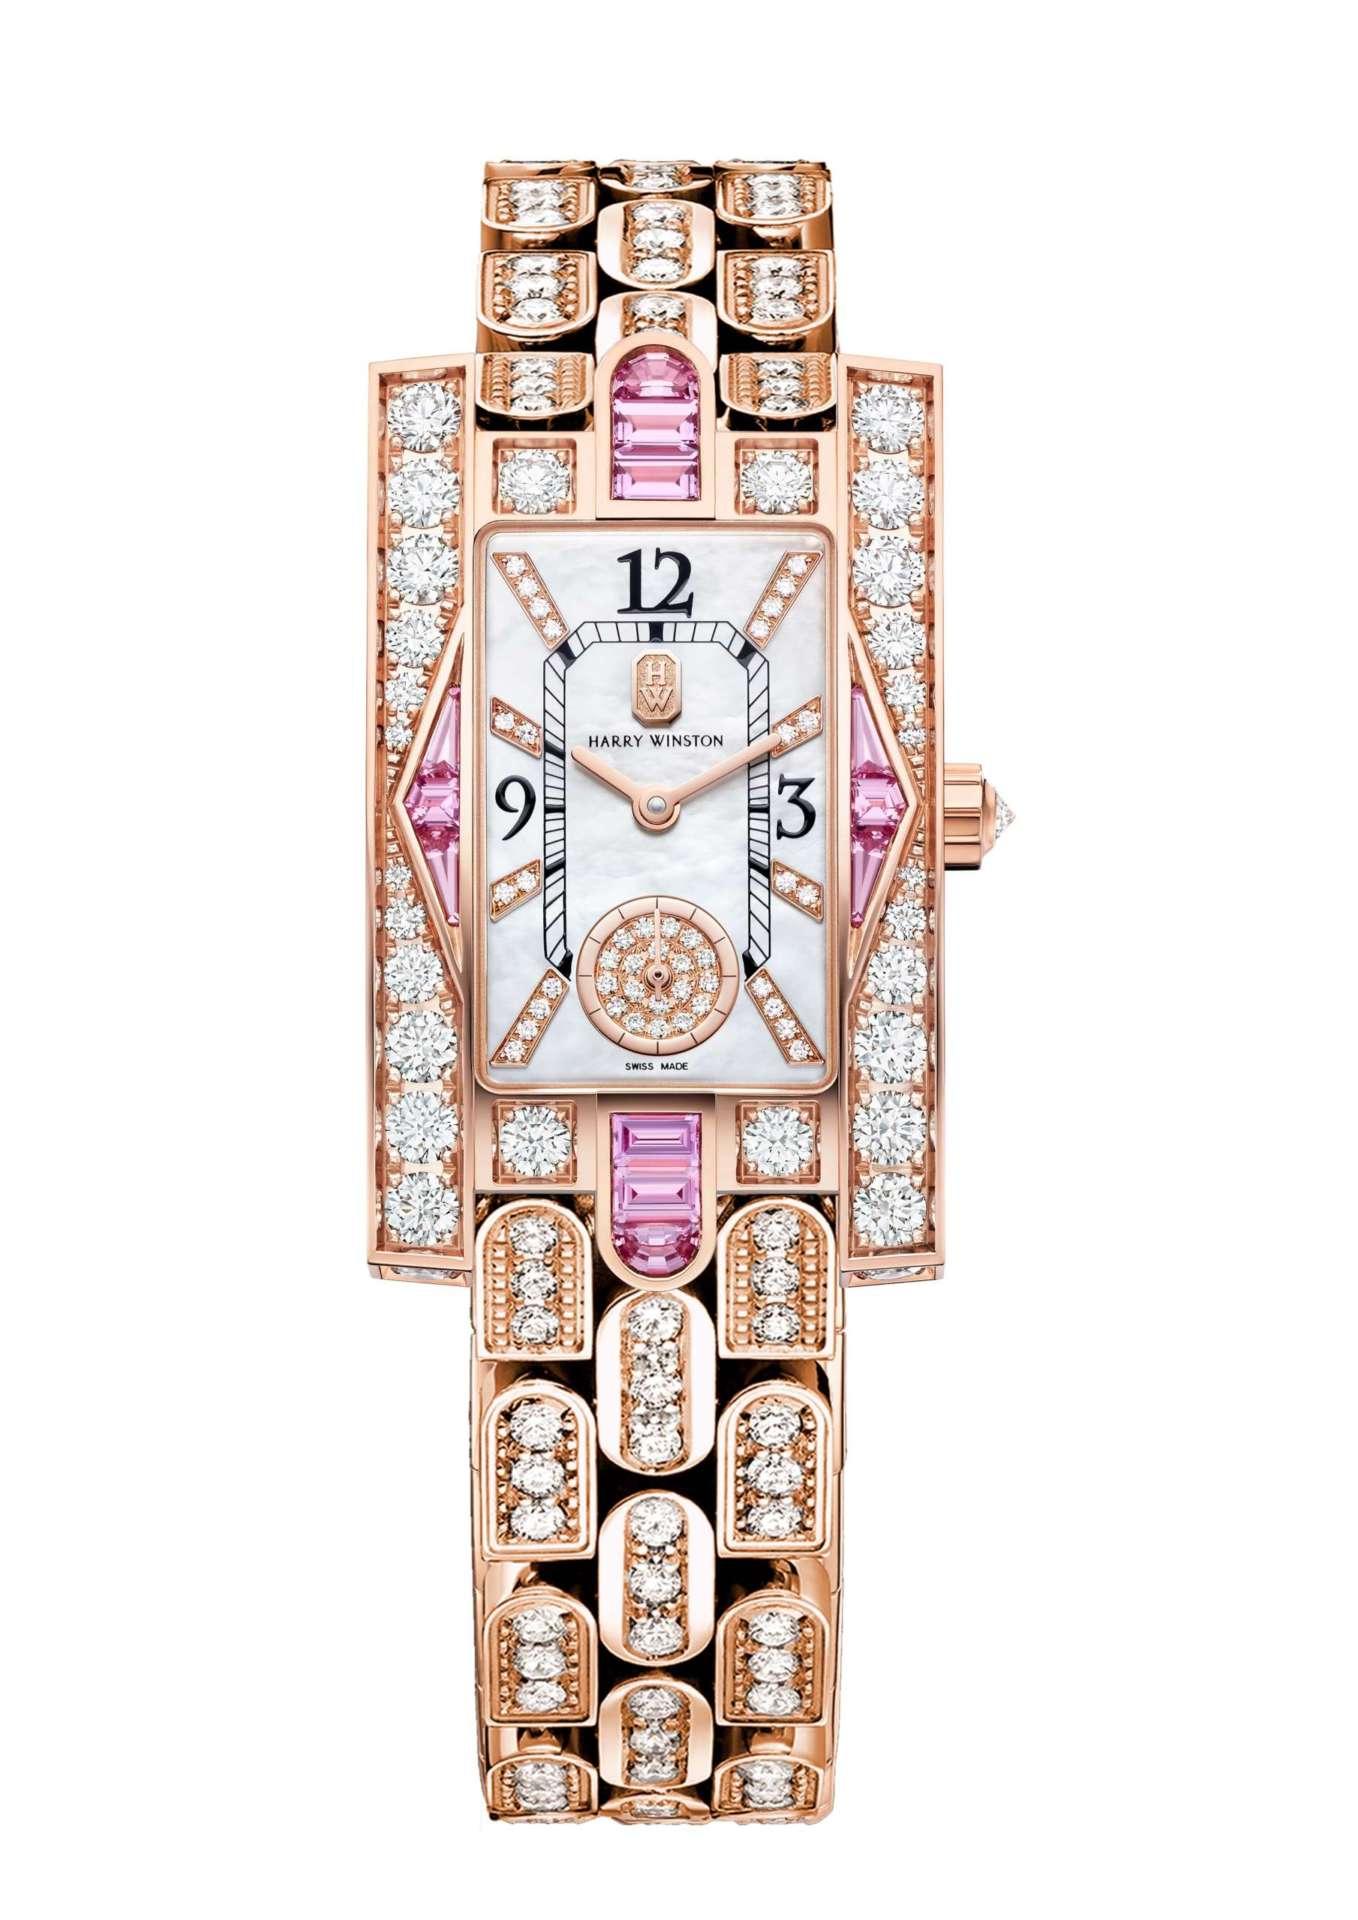 WATCH THIS|10只磅礴抵台的海瑞溫斯頓腕錶